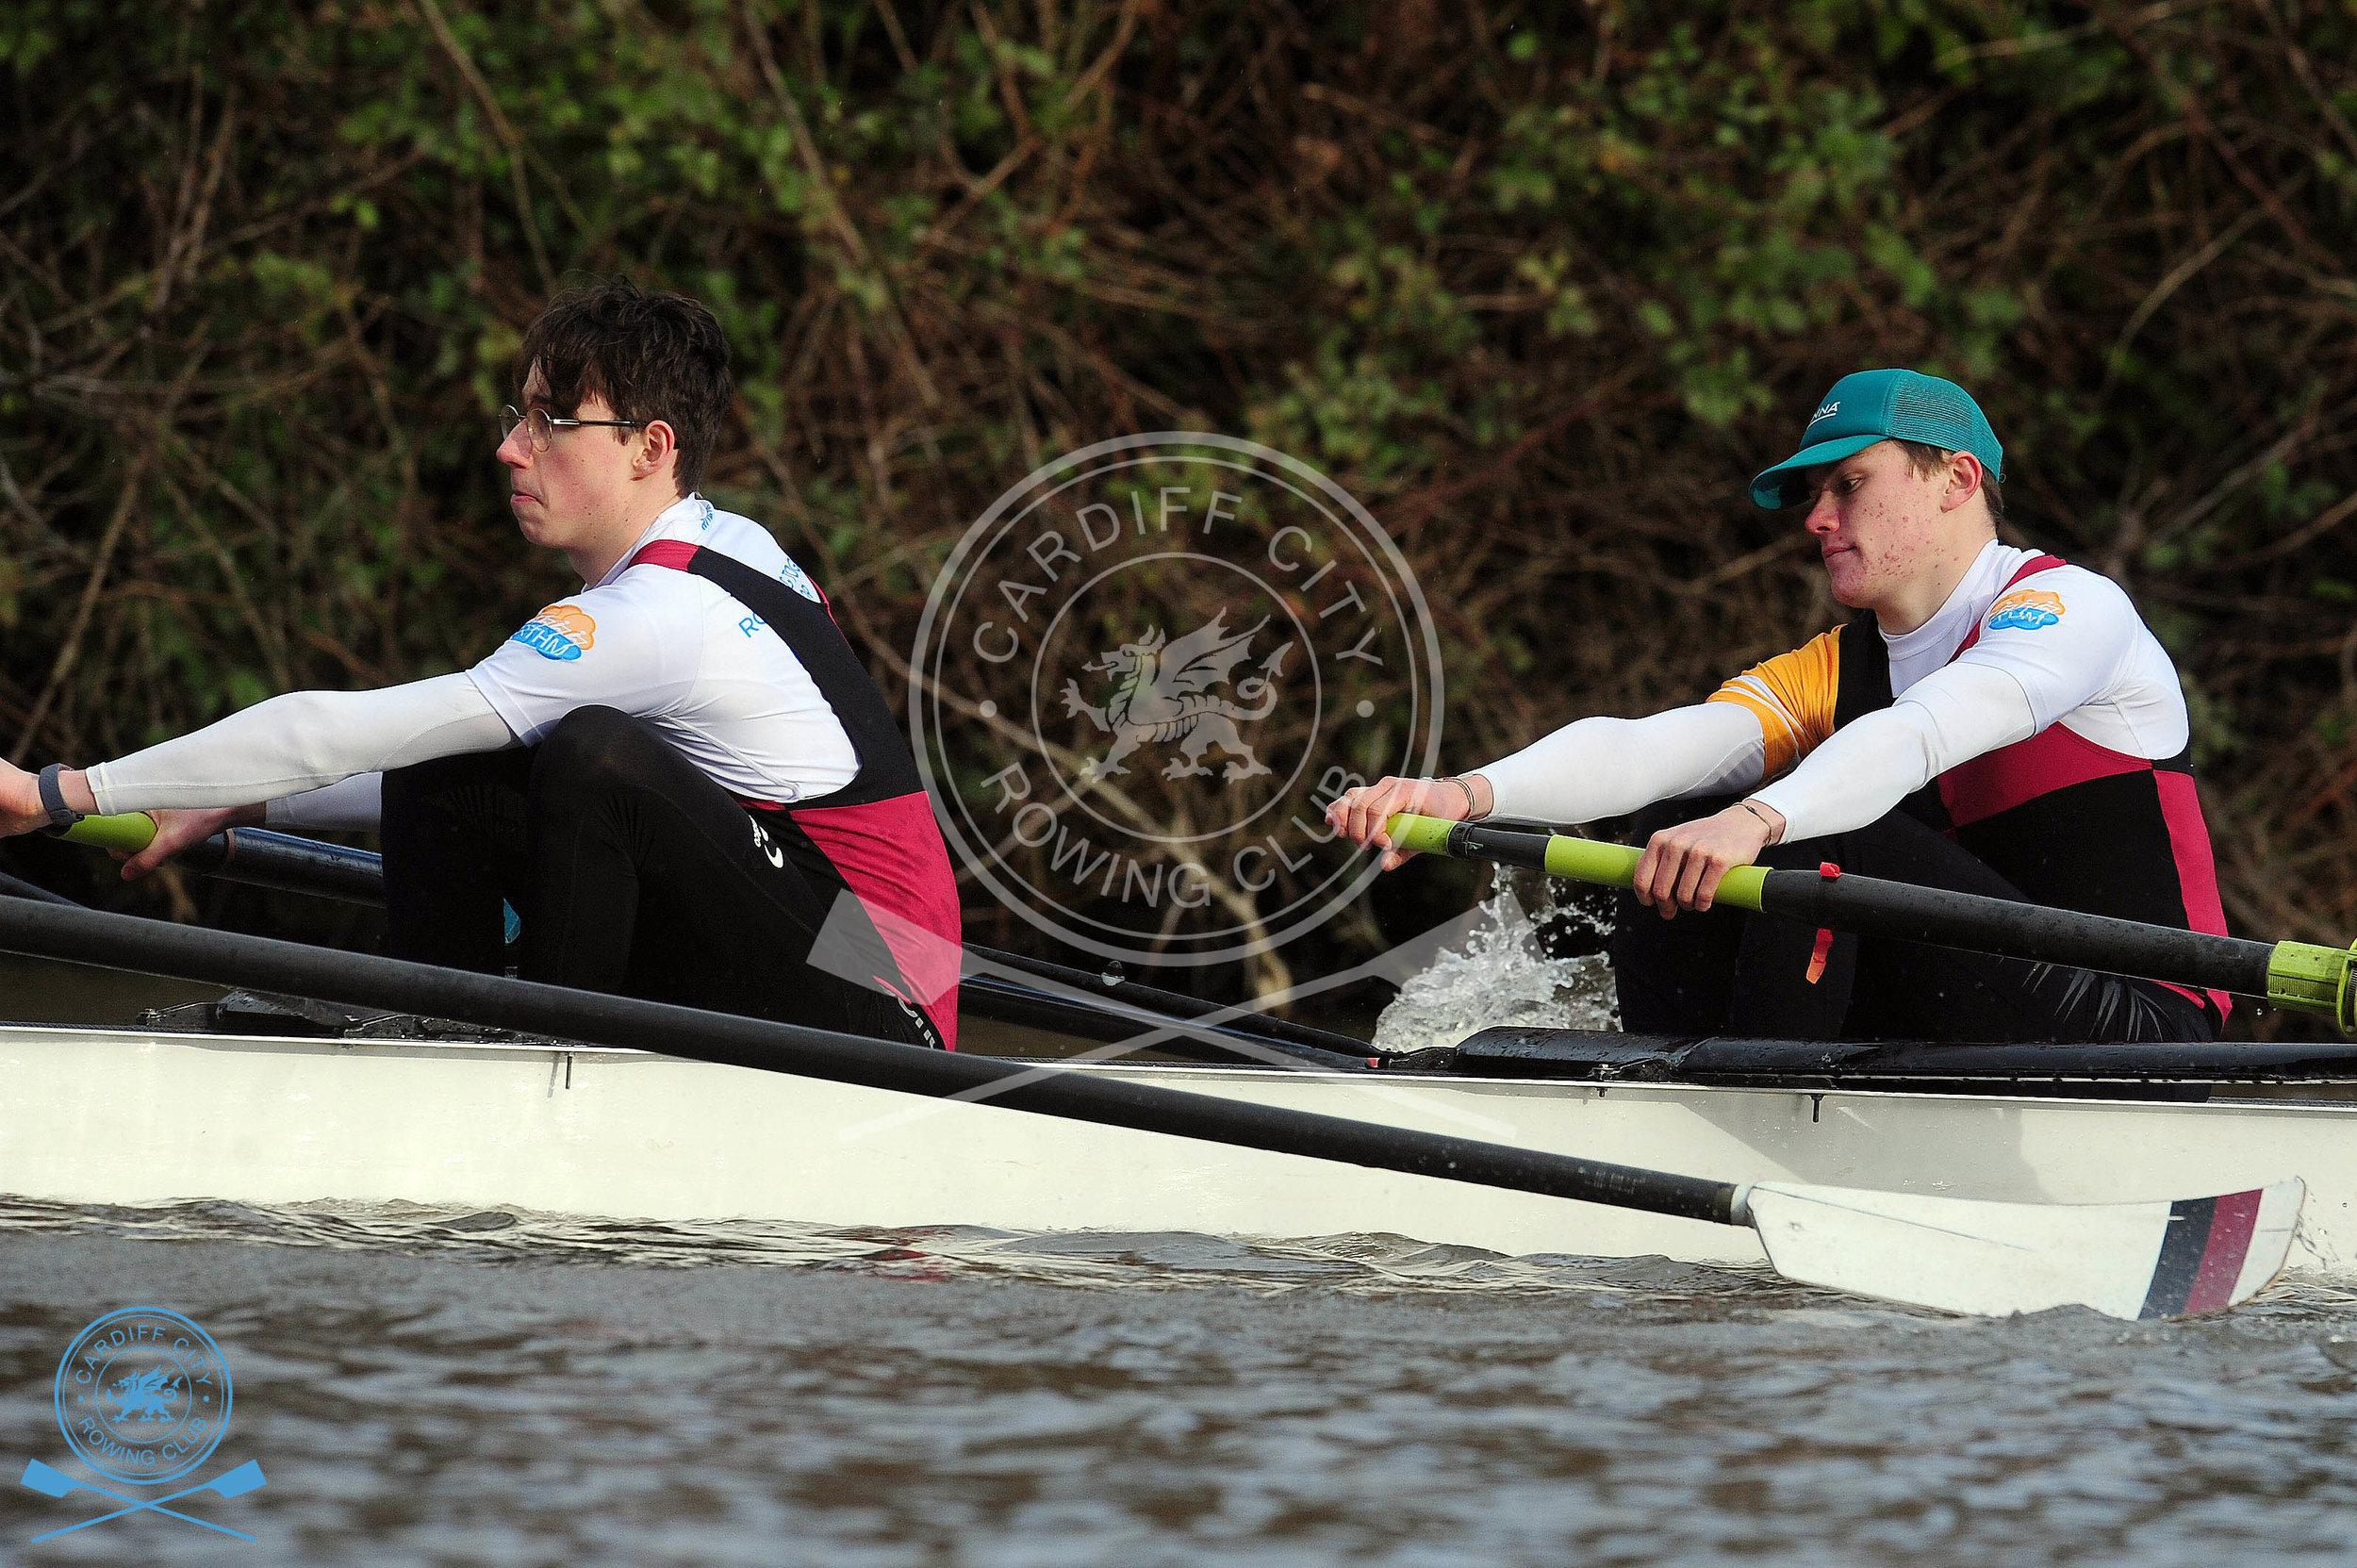 DW_280119_Cardiff_City_Rowing_273.jpg